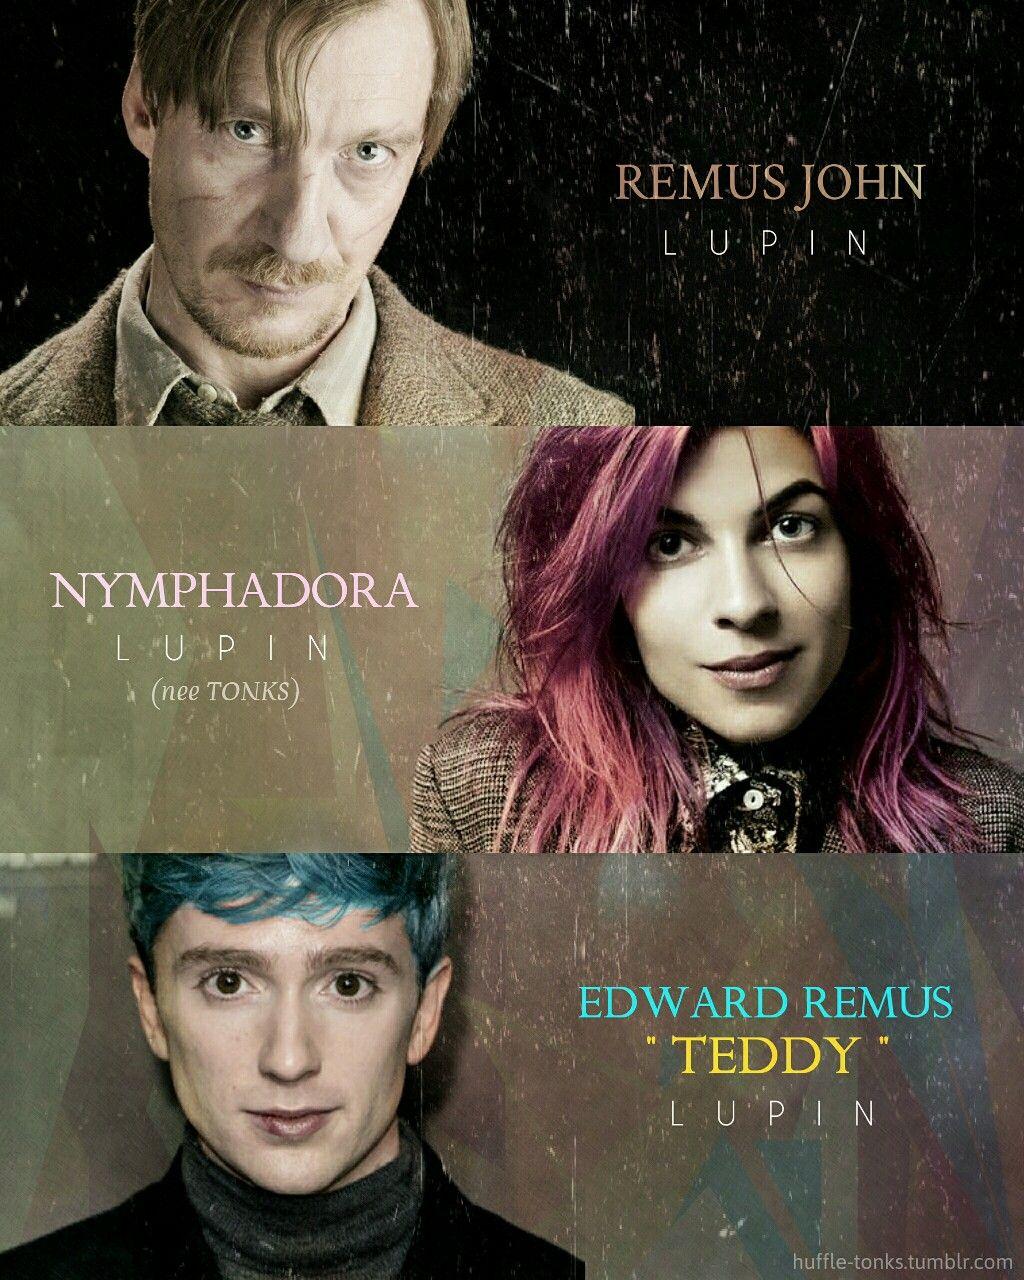 Remus Dora Teddy The Lupin Family Tonks Harry Potter Harry Potter Pictures Harry Potter Artwork